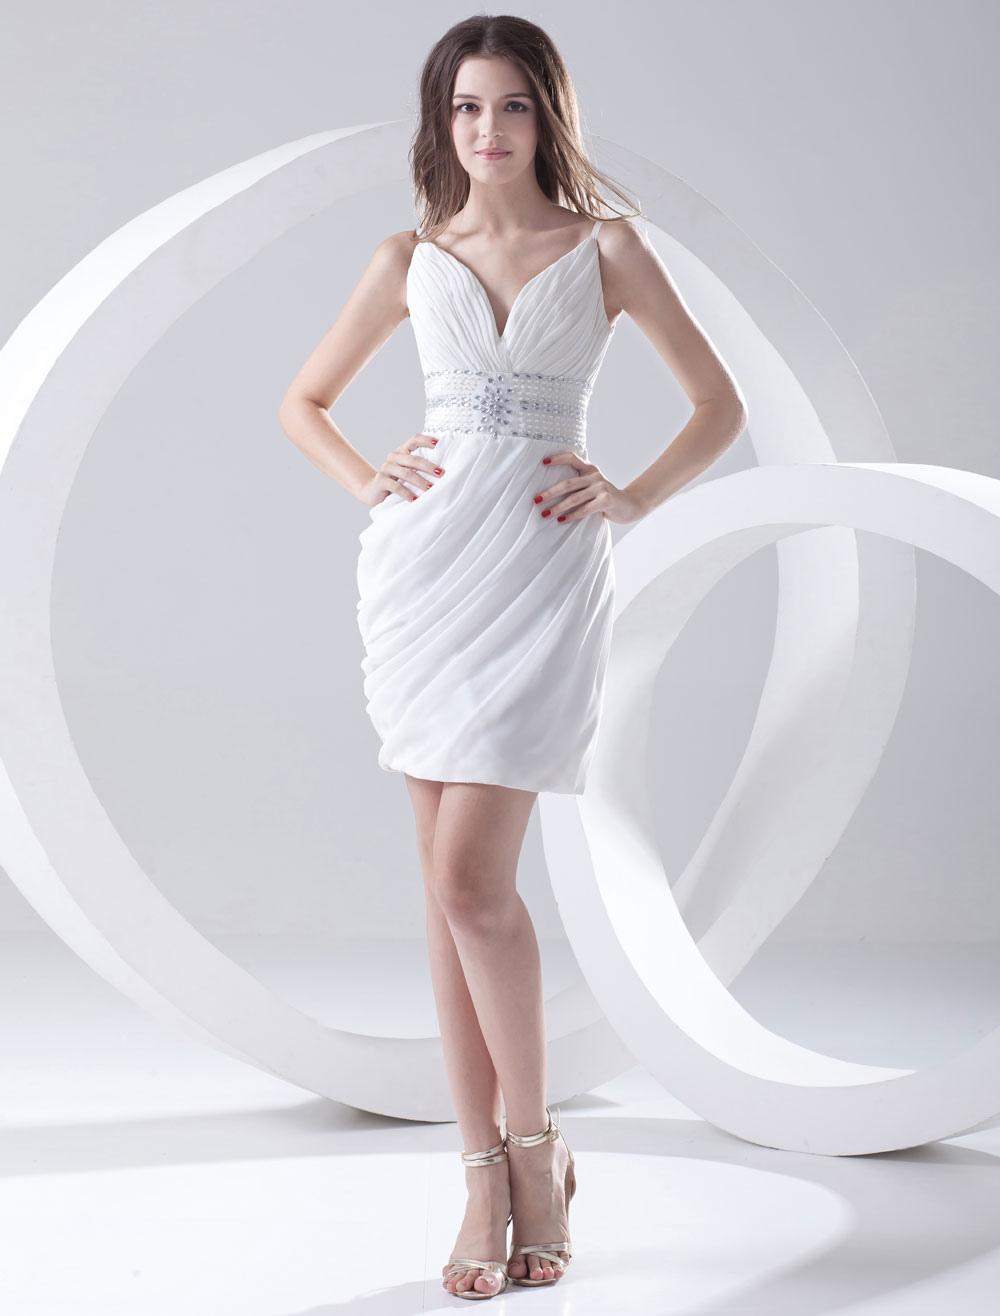 Sheath White Chiffon Rhinestone Short Women's Cocktail Dress